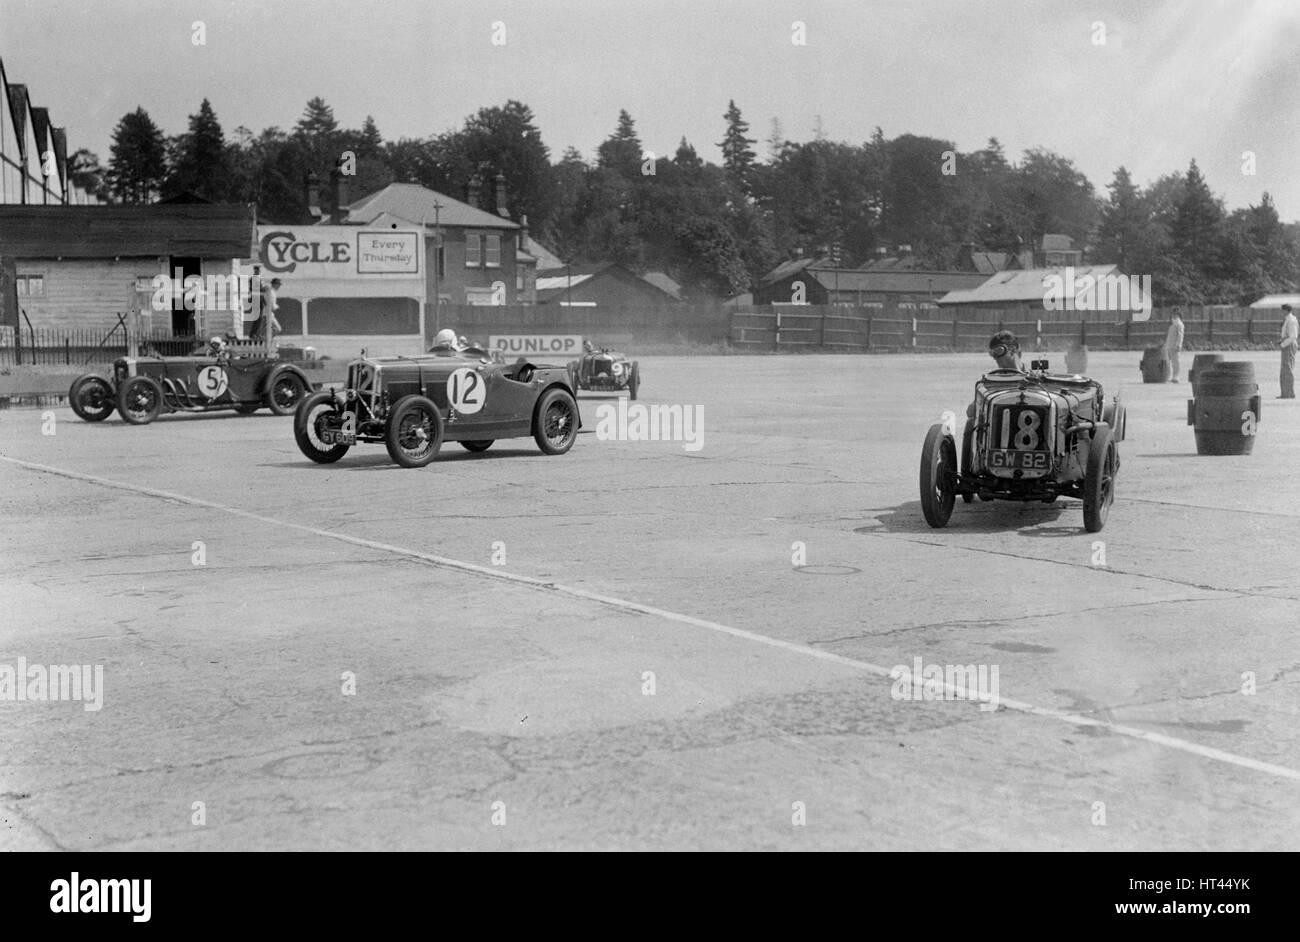 Frazer-Nash, Wolseley Hornet and Riley 9 Brooklands, BARC meeting, Brooklands, Surrey, 1933. Artist: Bill Brunell. - Stock Image